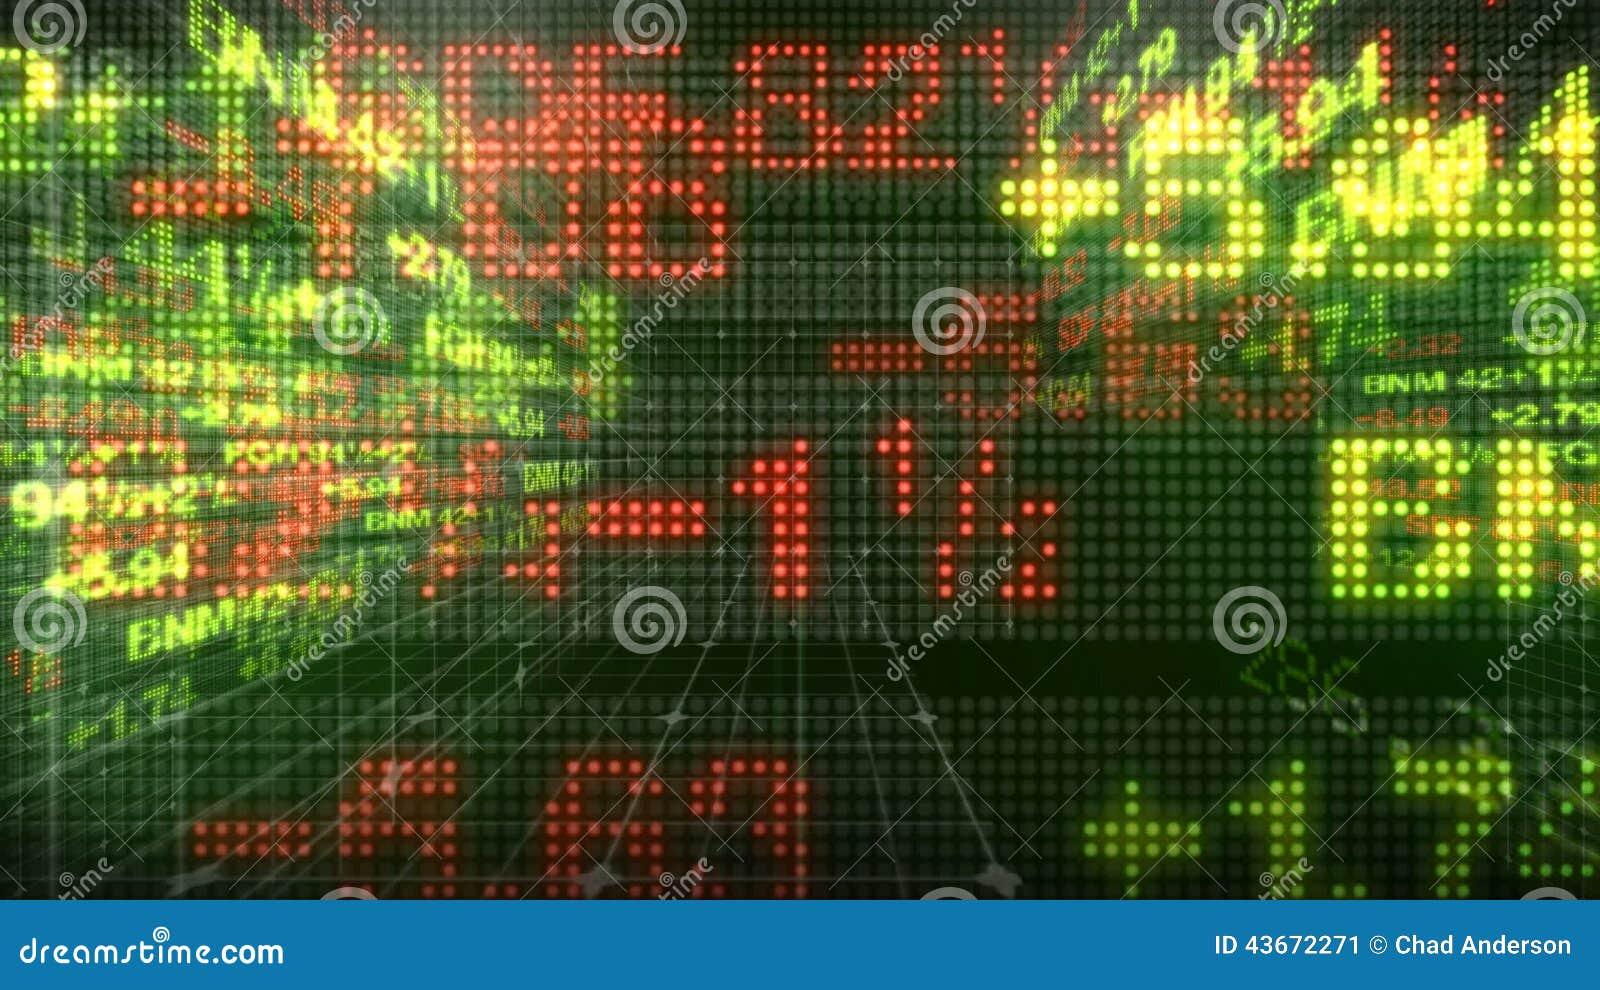 Stock market data tickers 3d world stock video video of nikkei stock market data tickers 3d world stock video video of nikkei business 43672271 buycottarizona Gallery